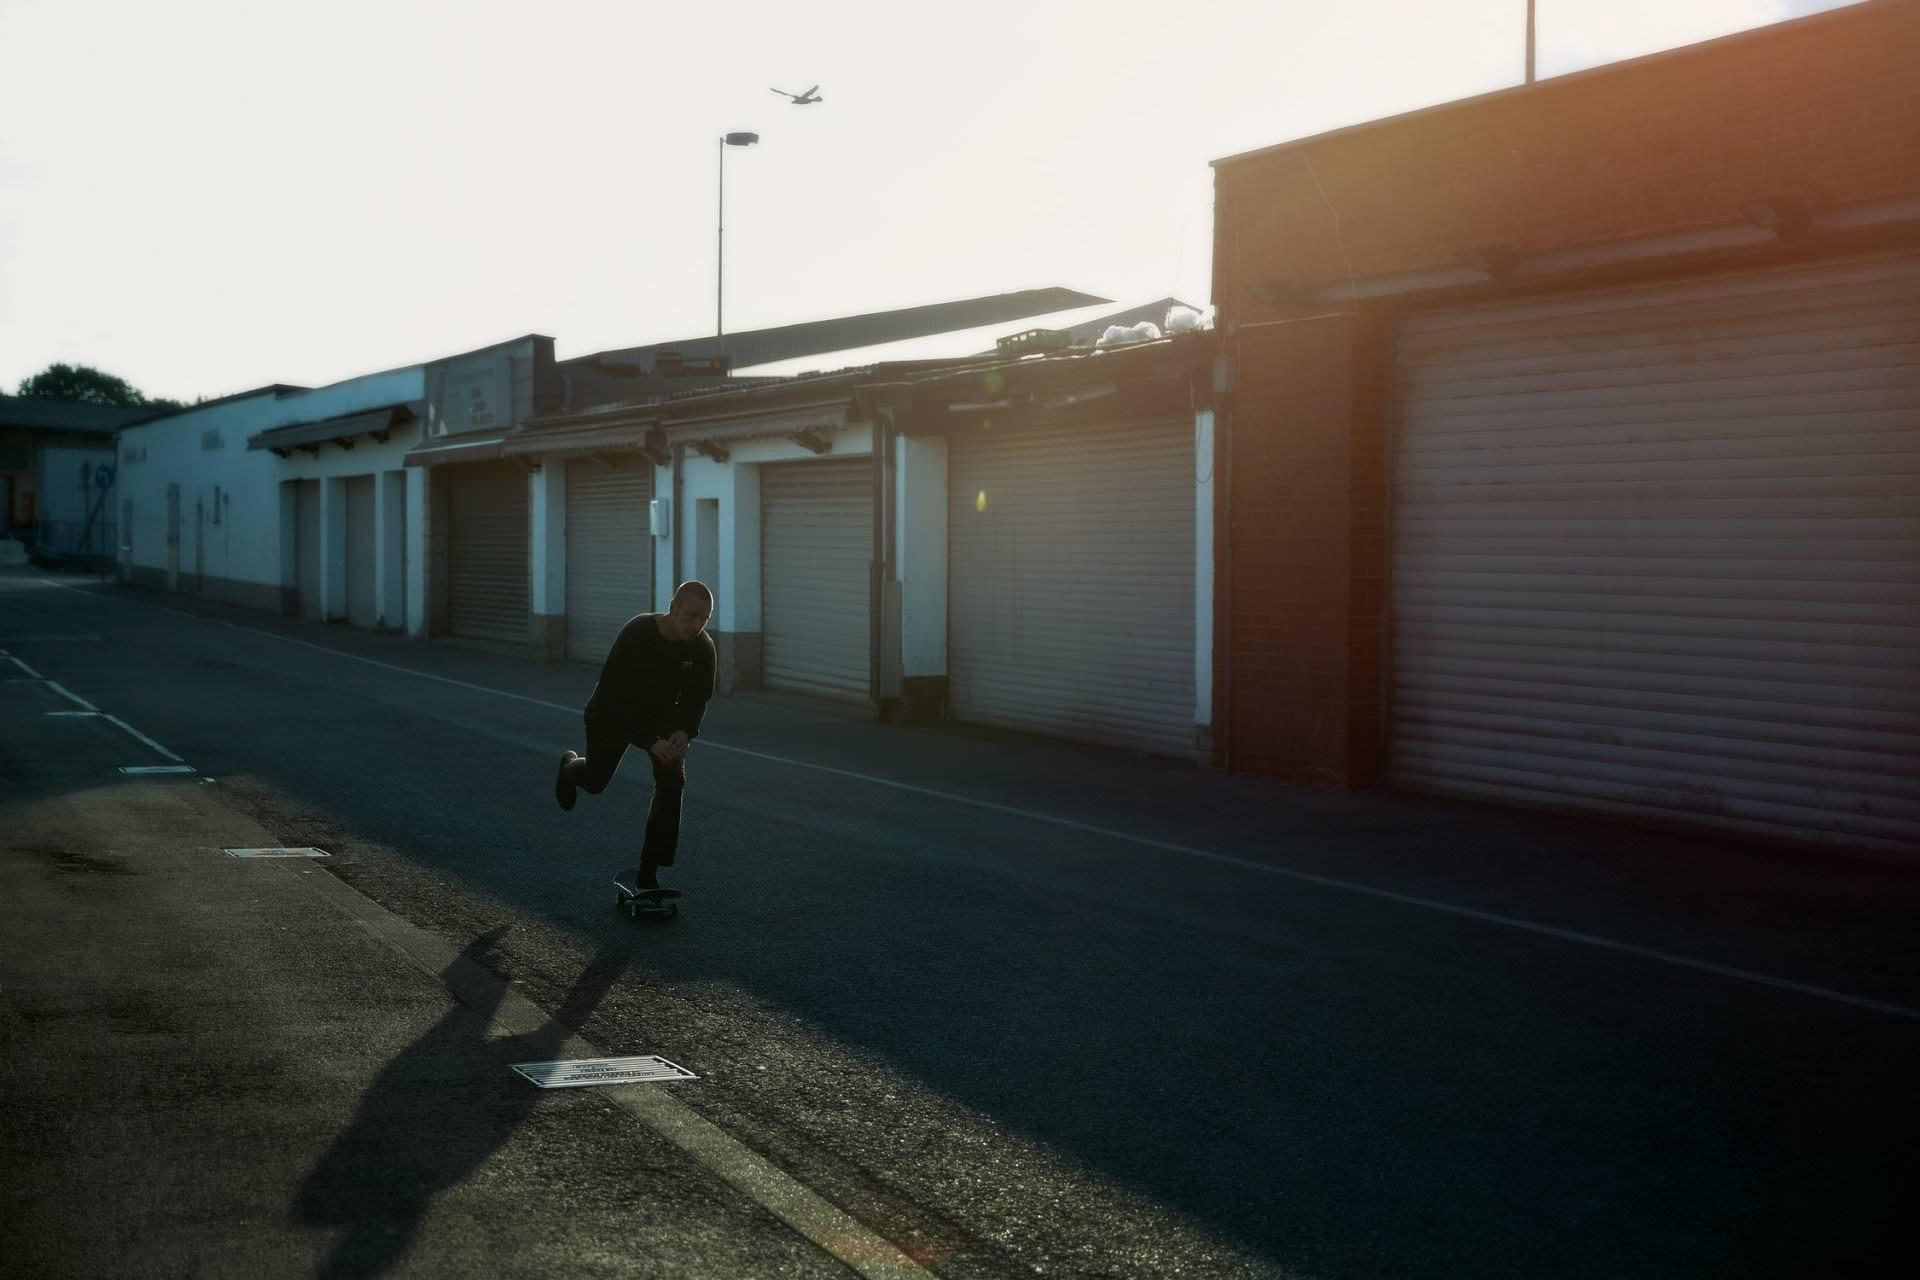 photo, photos, photography, photographer, photographers, man, men, skate, skating, skateboard, dark, shadow, building, buildings, lot, street